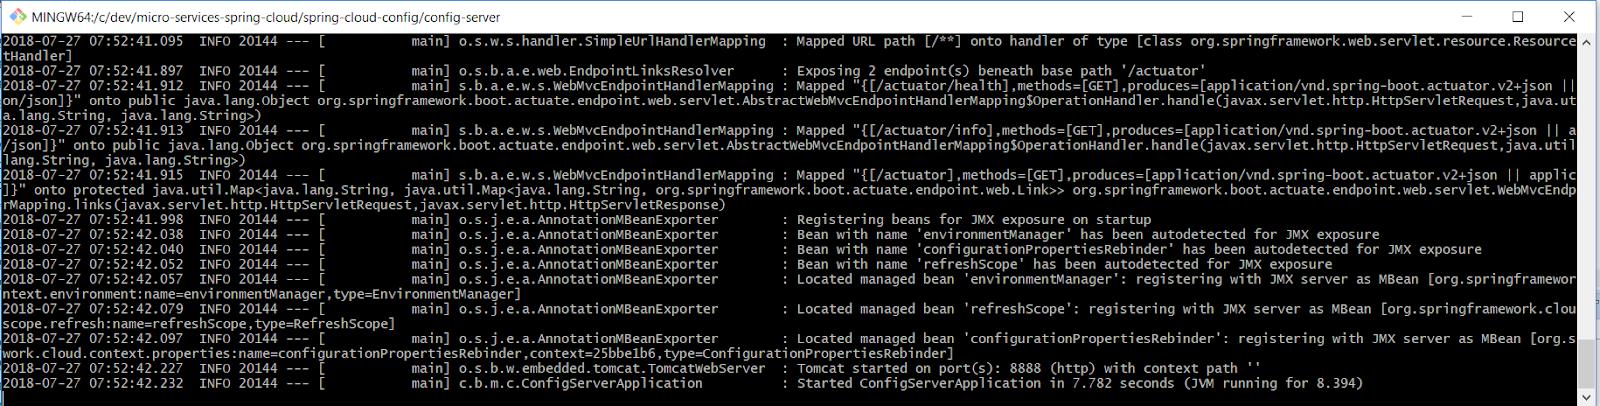 Cloud Config Service Startup Port 8888